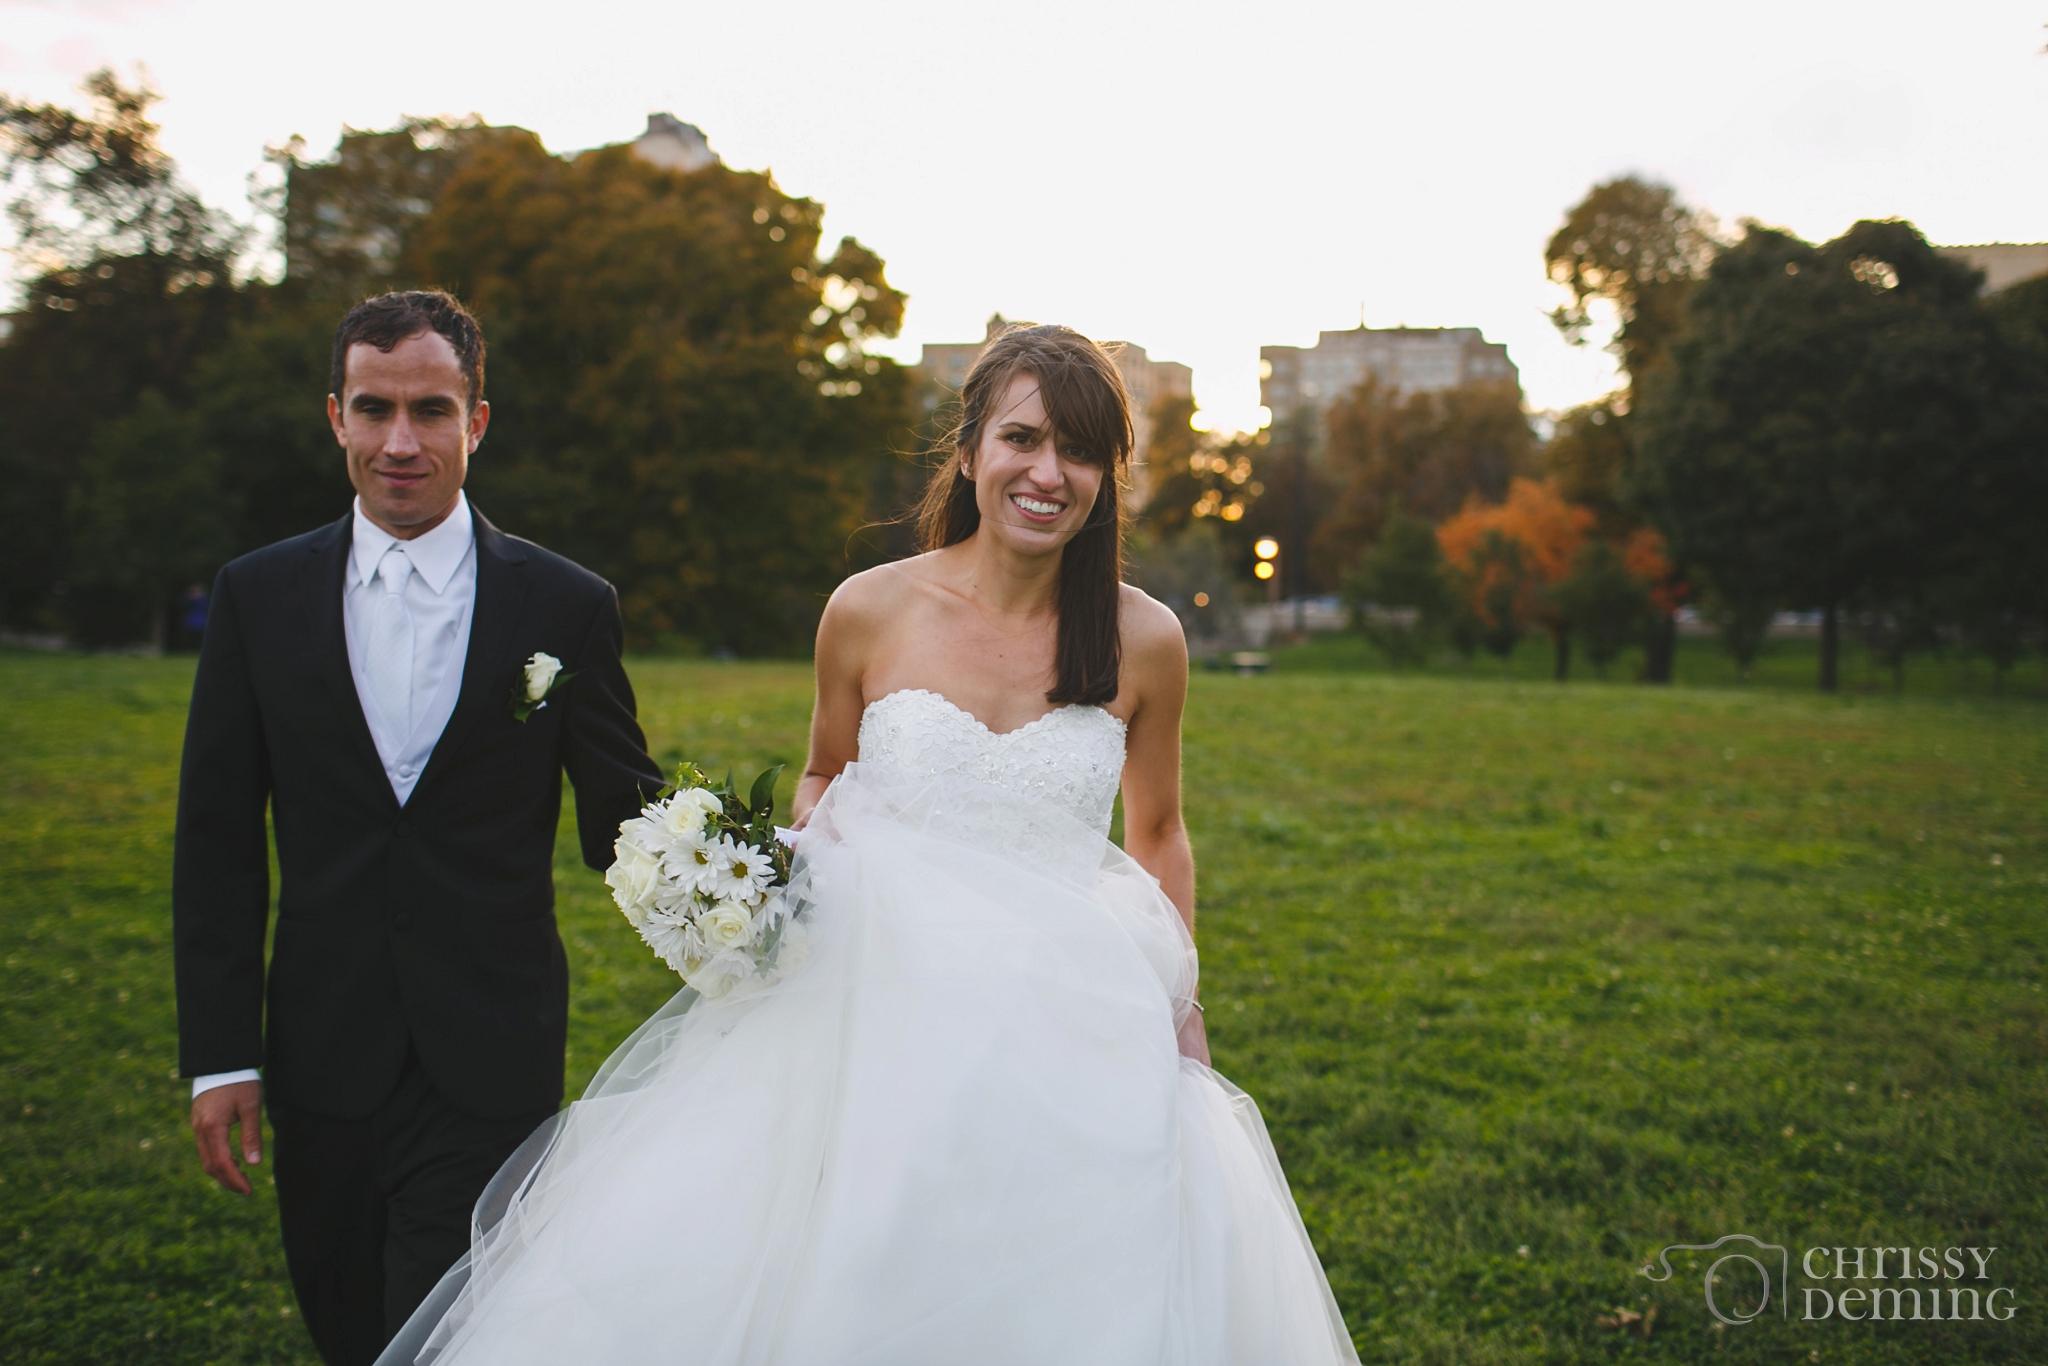 promontory_point_chicago_wedding_photography_0028.jpg